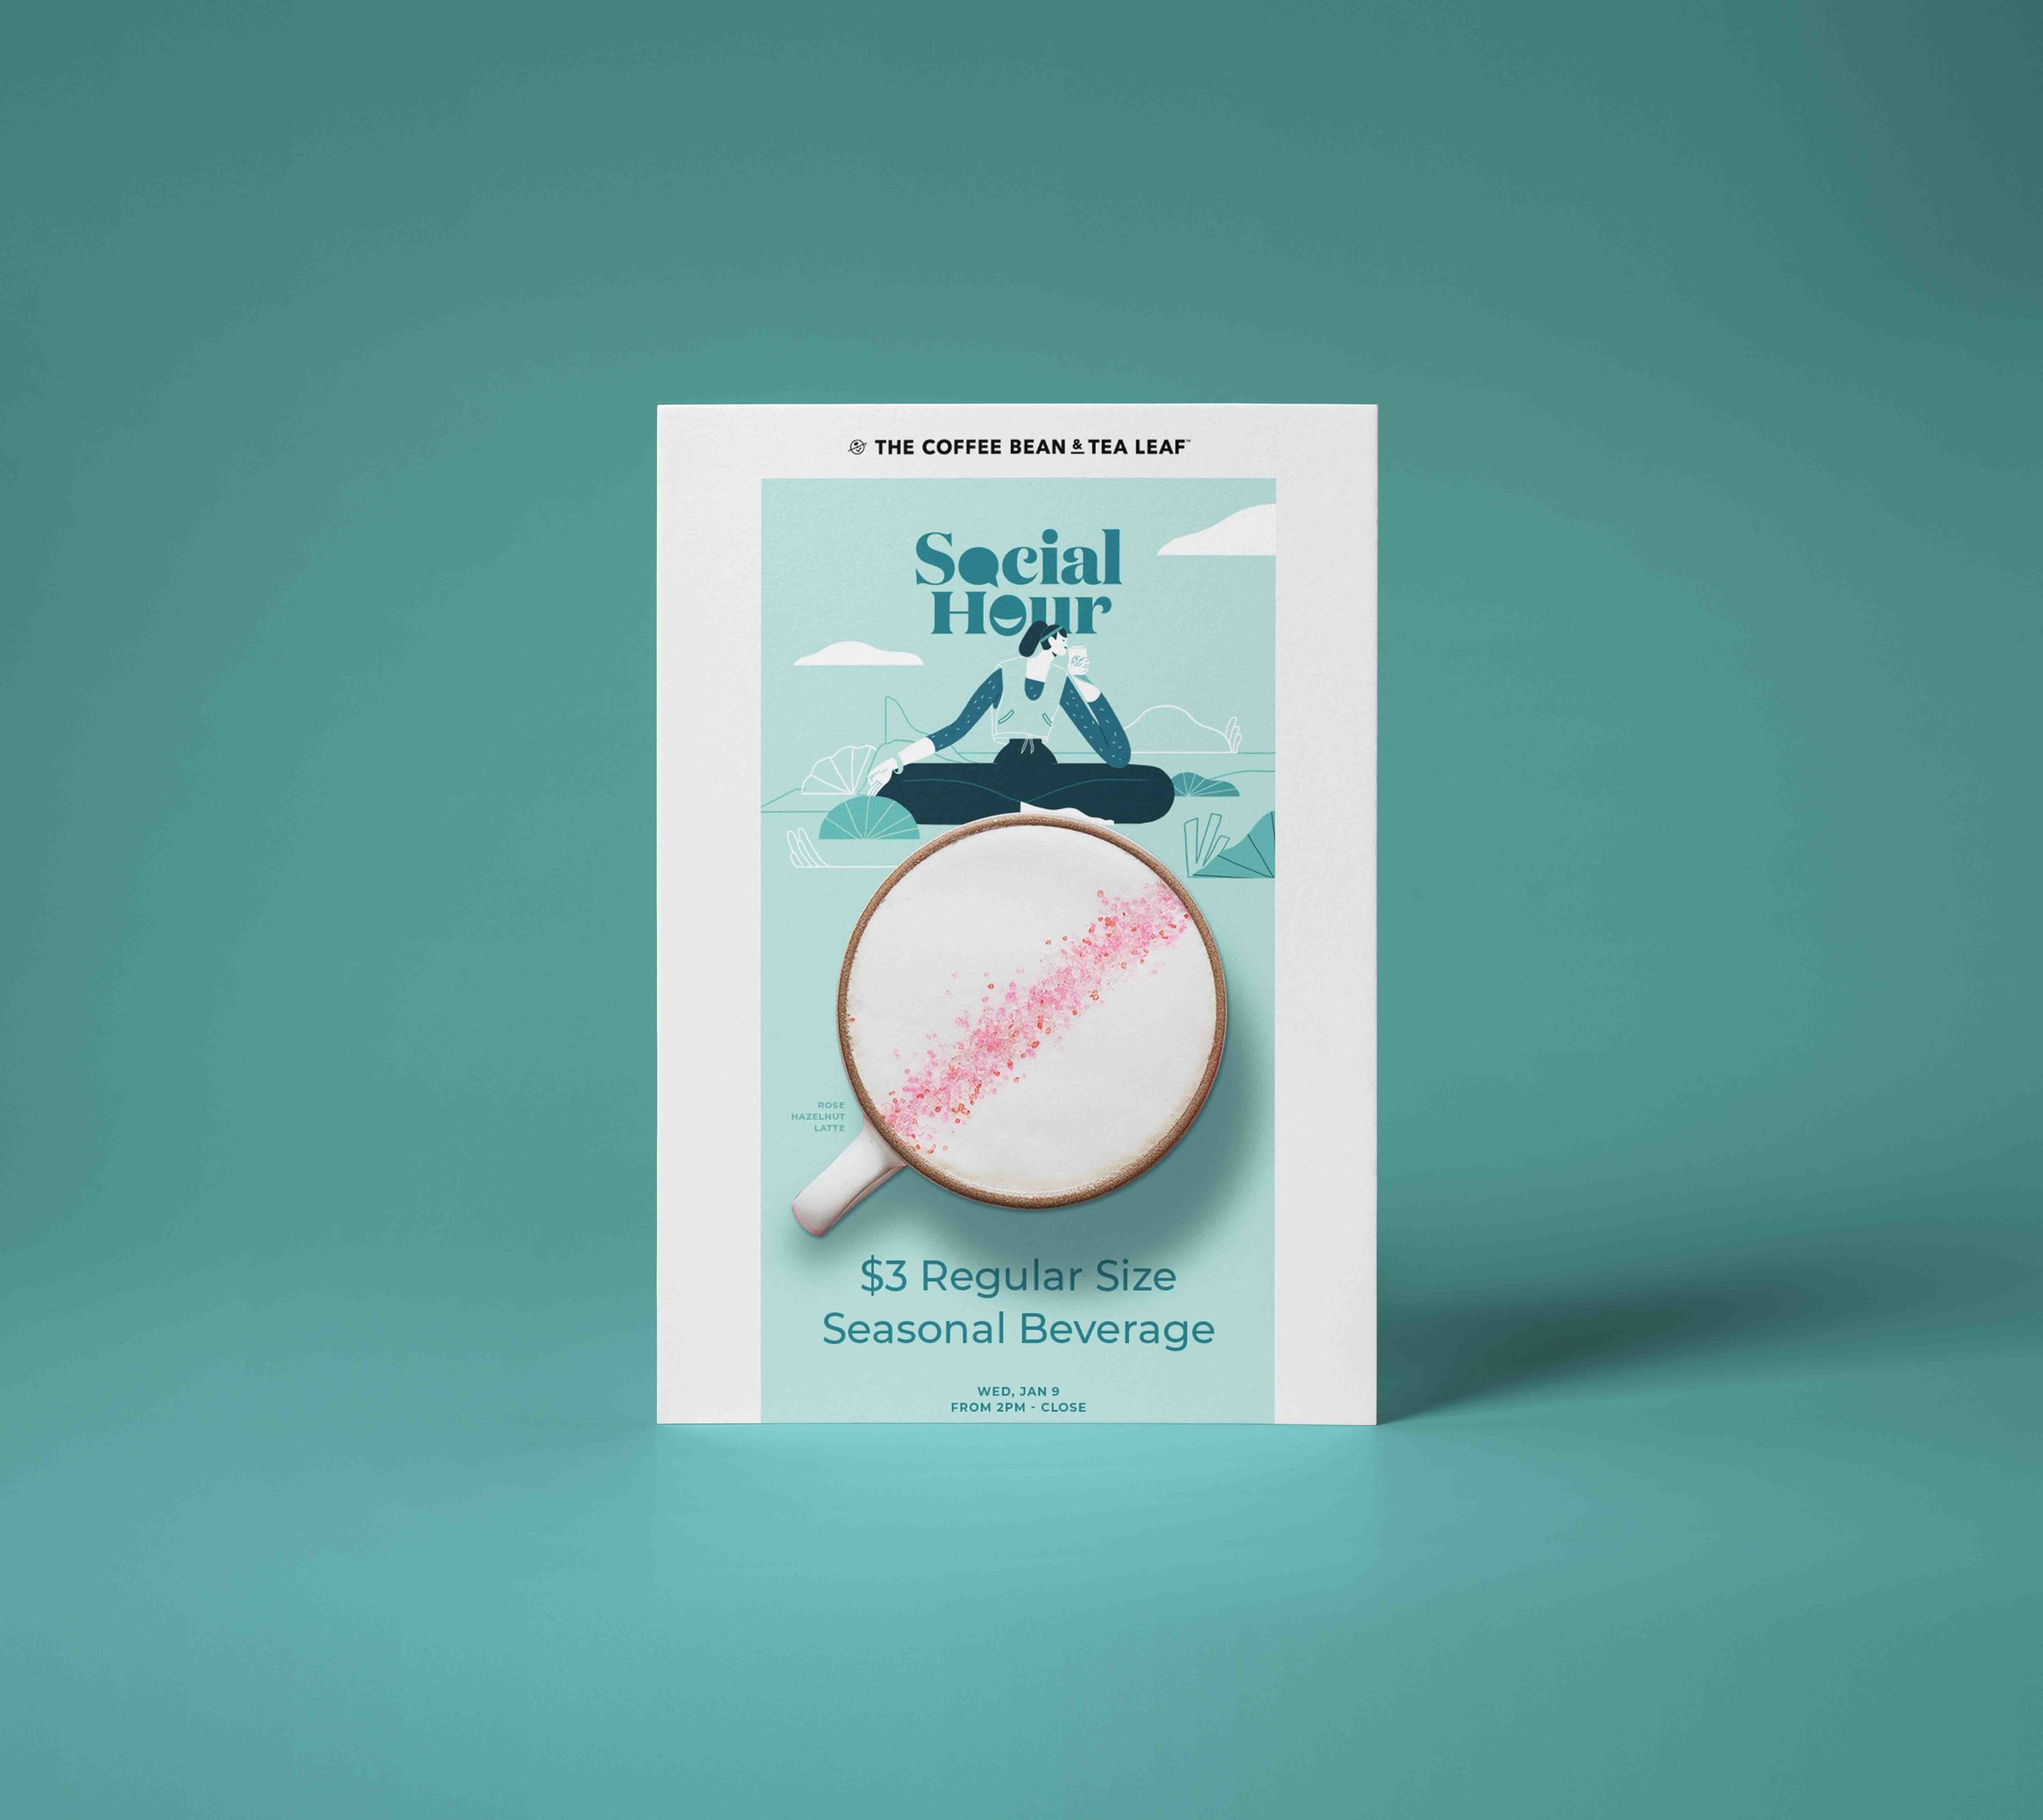 Paper-Brand-Mockup-Vol7enbaja.jpg